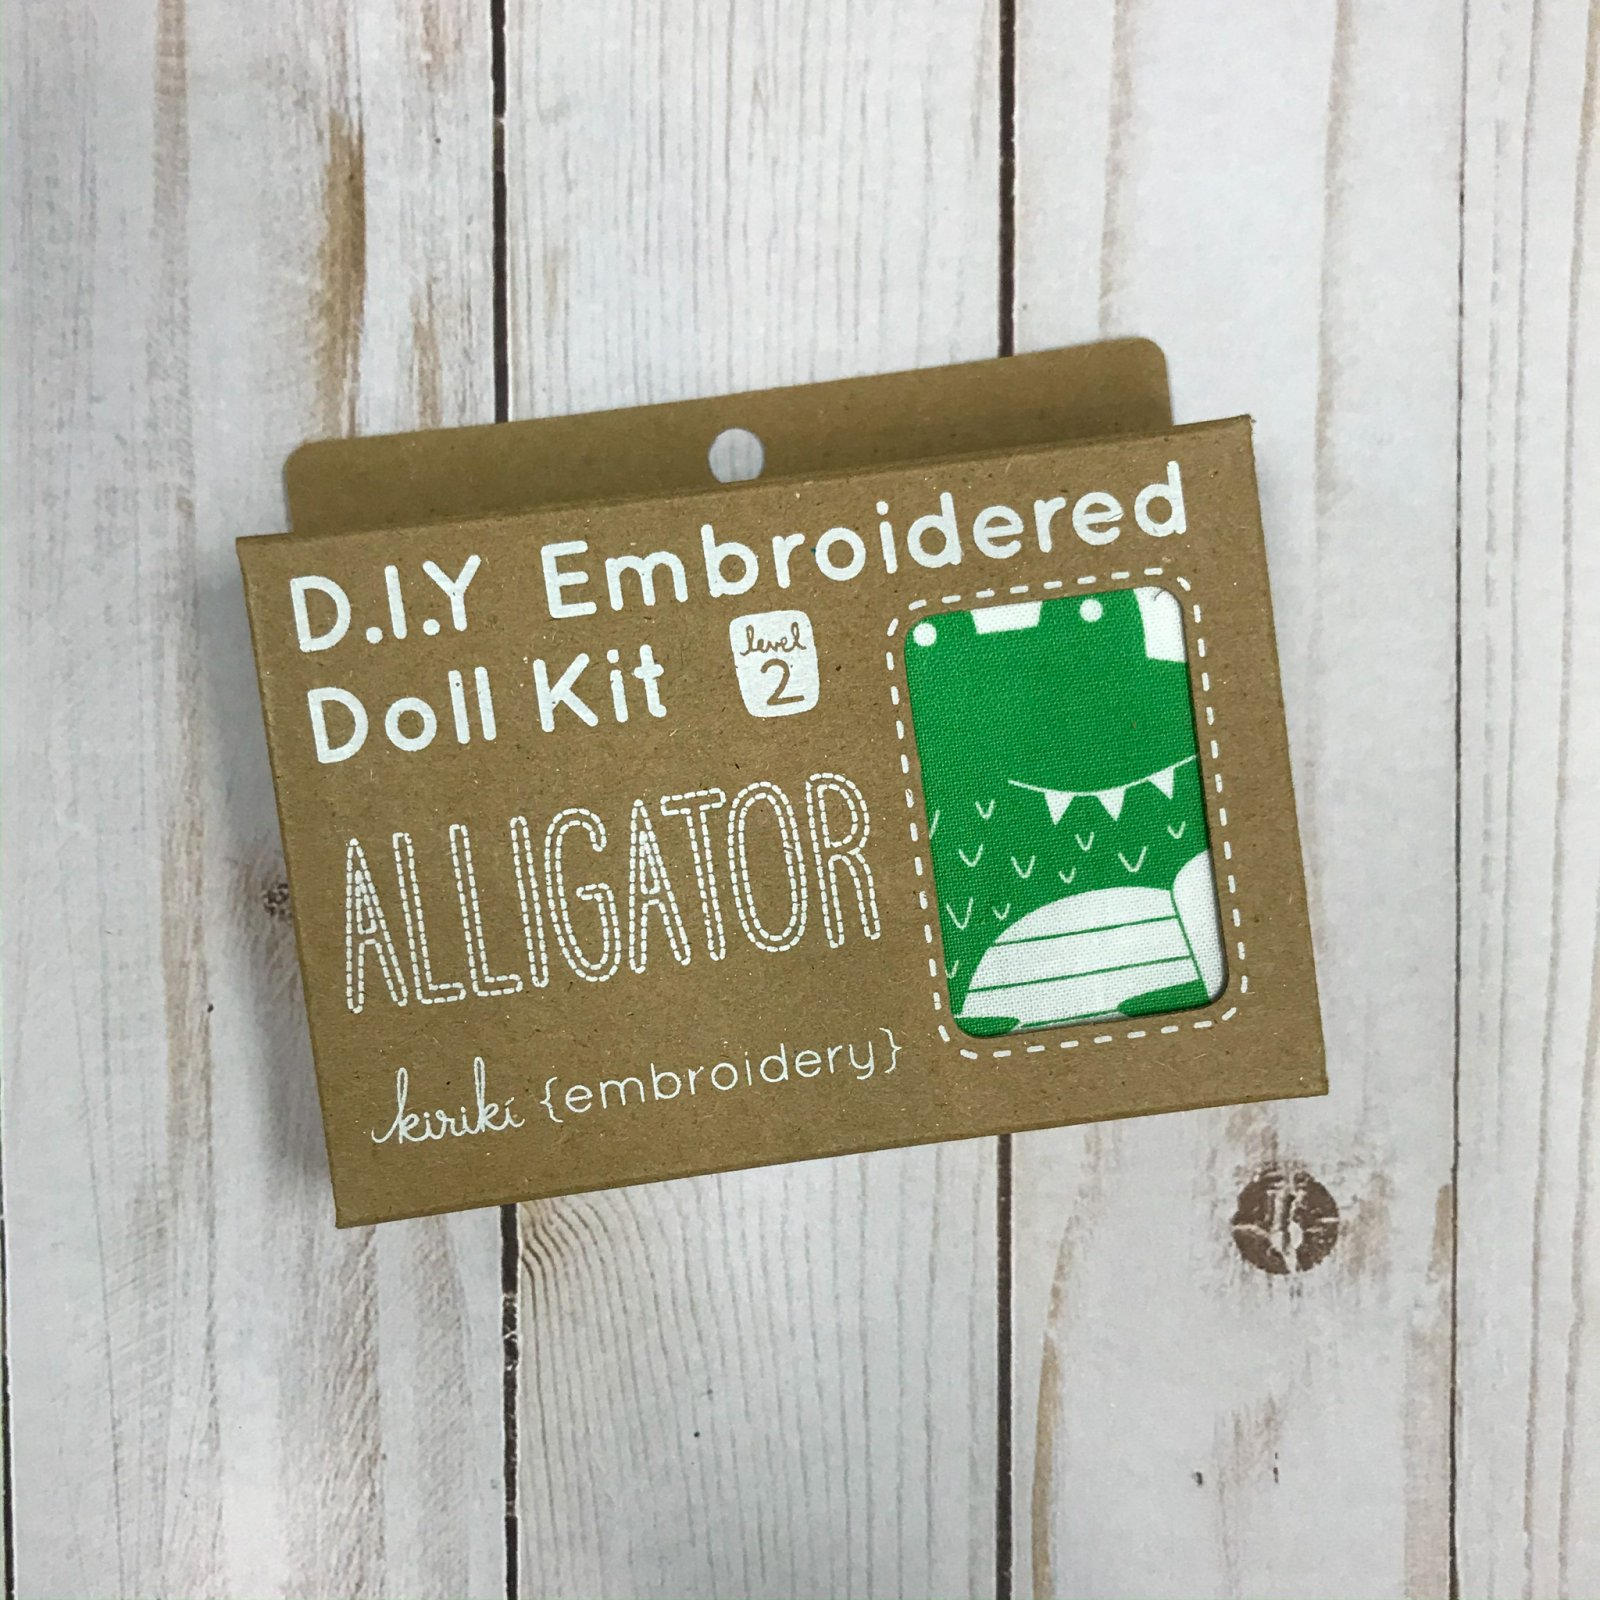 Embroidered Doll Kit - Level 2 - Alligator